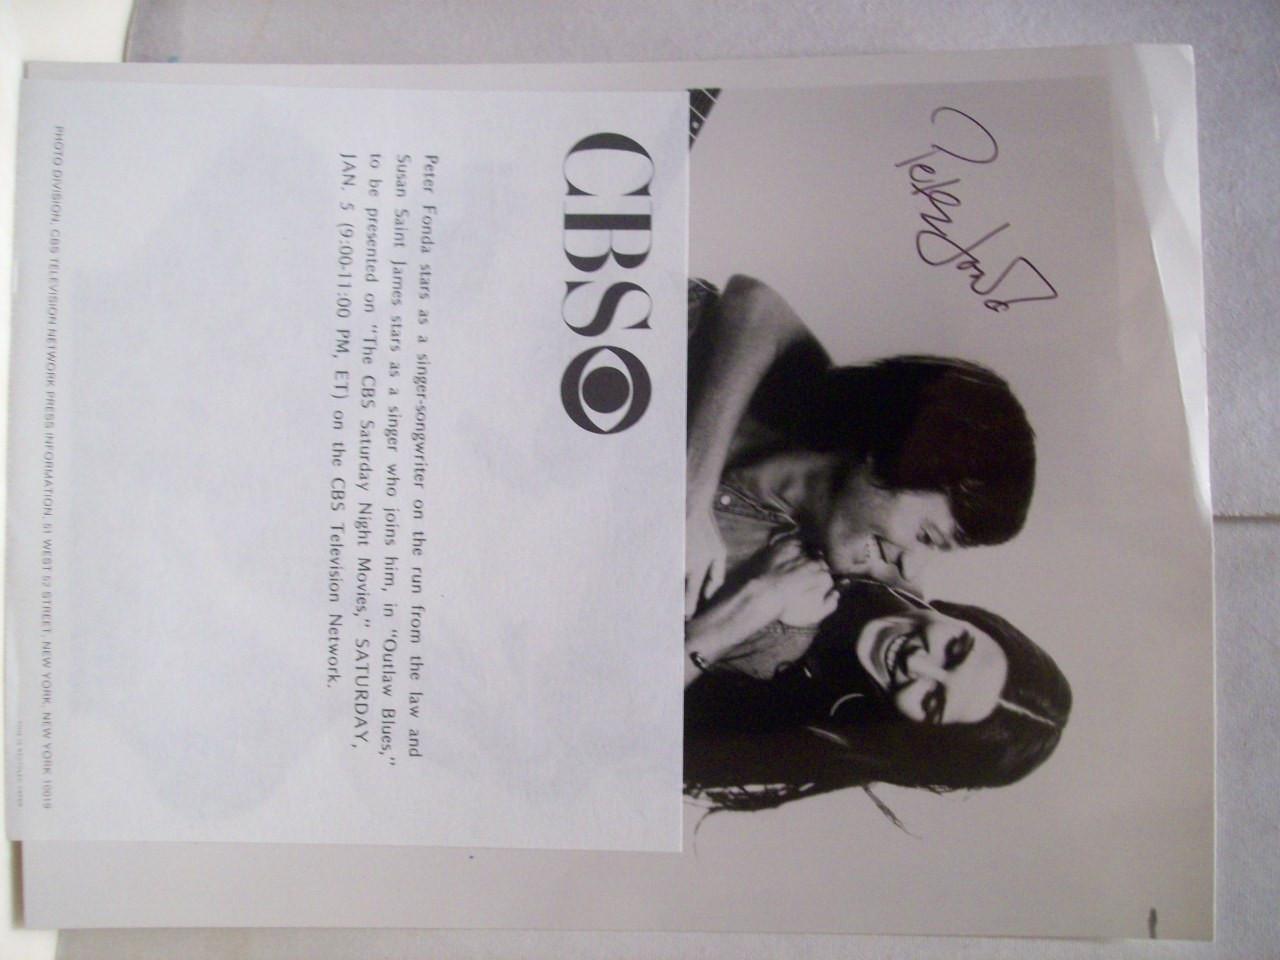 Fonda, Peter Photo Signed Autograph Outlaw Blues 1979